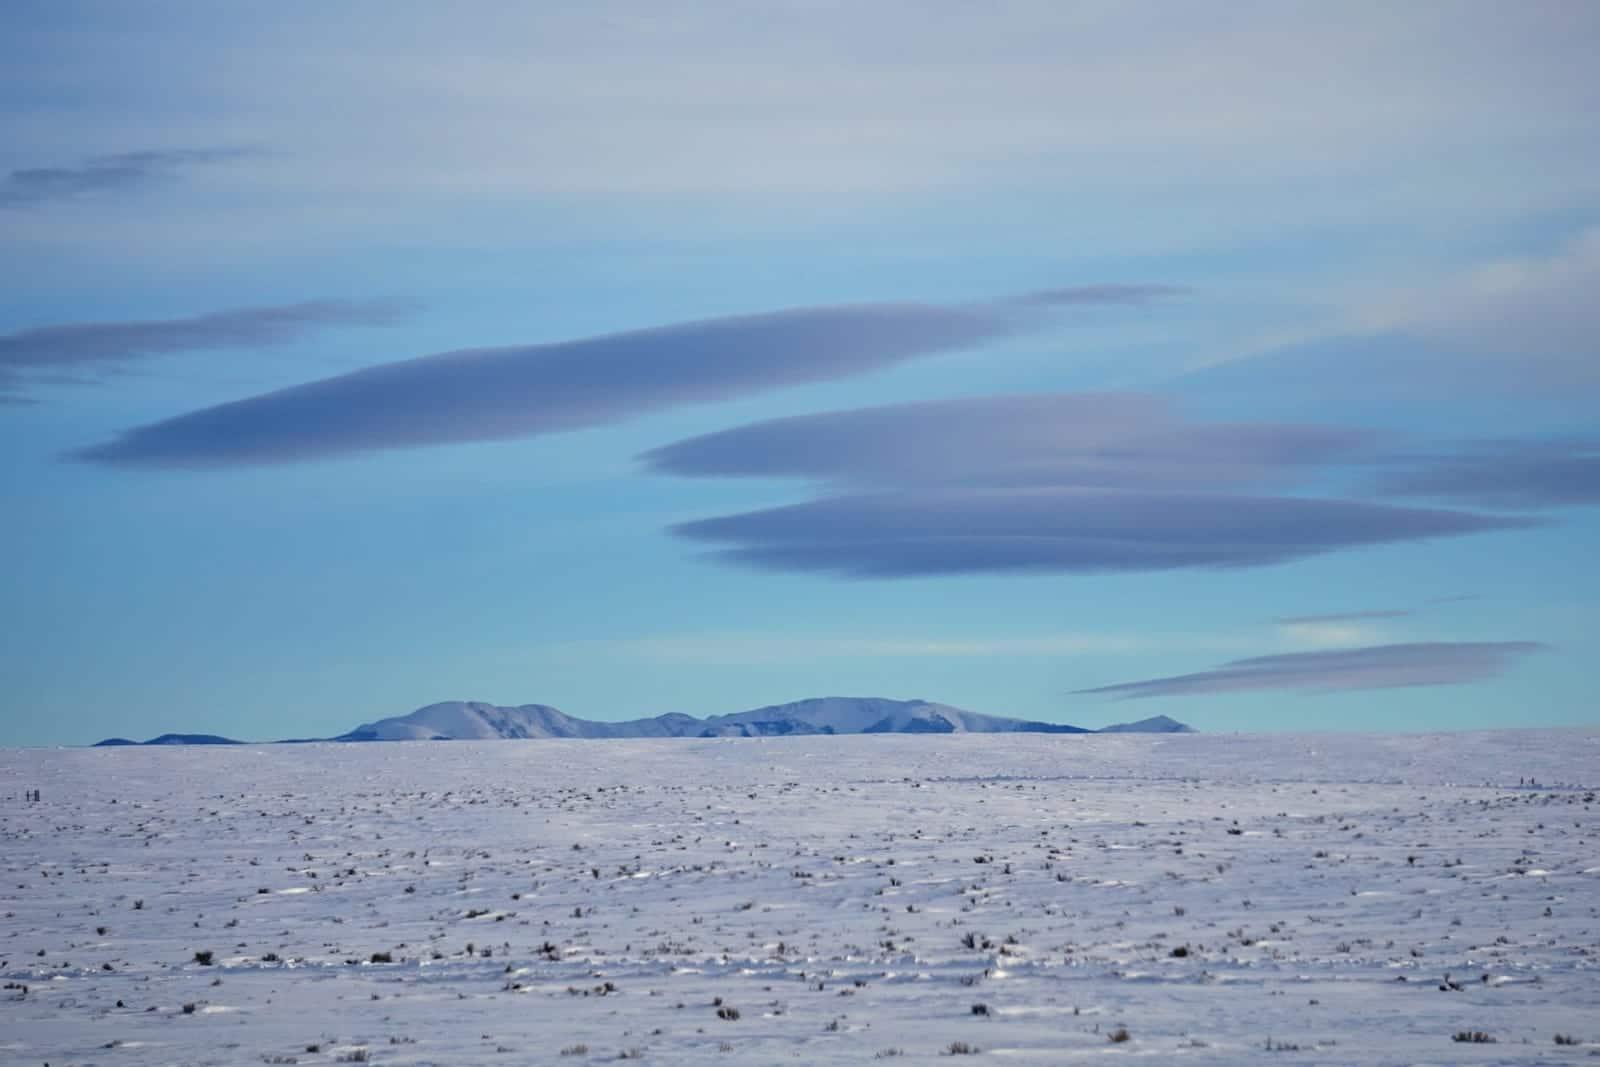 San Luis Valley Winter UFOS